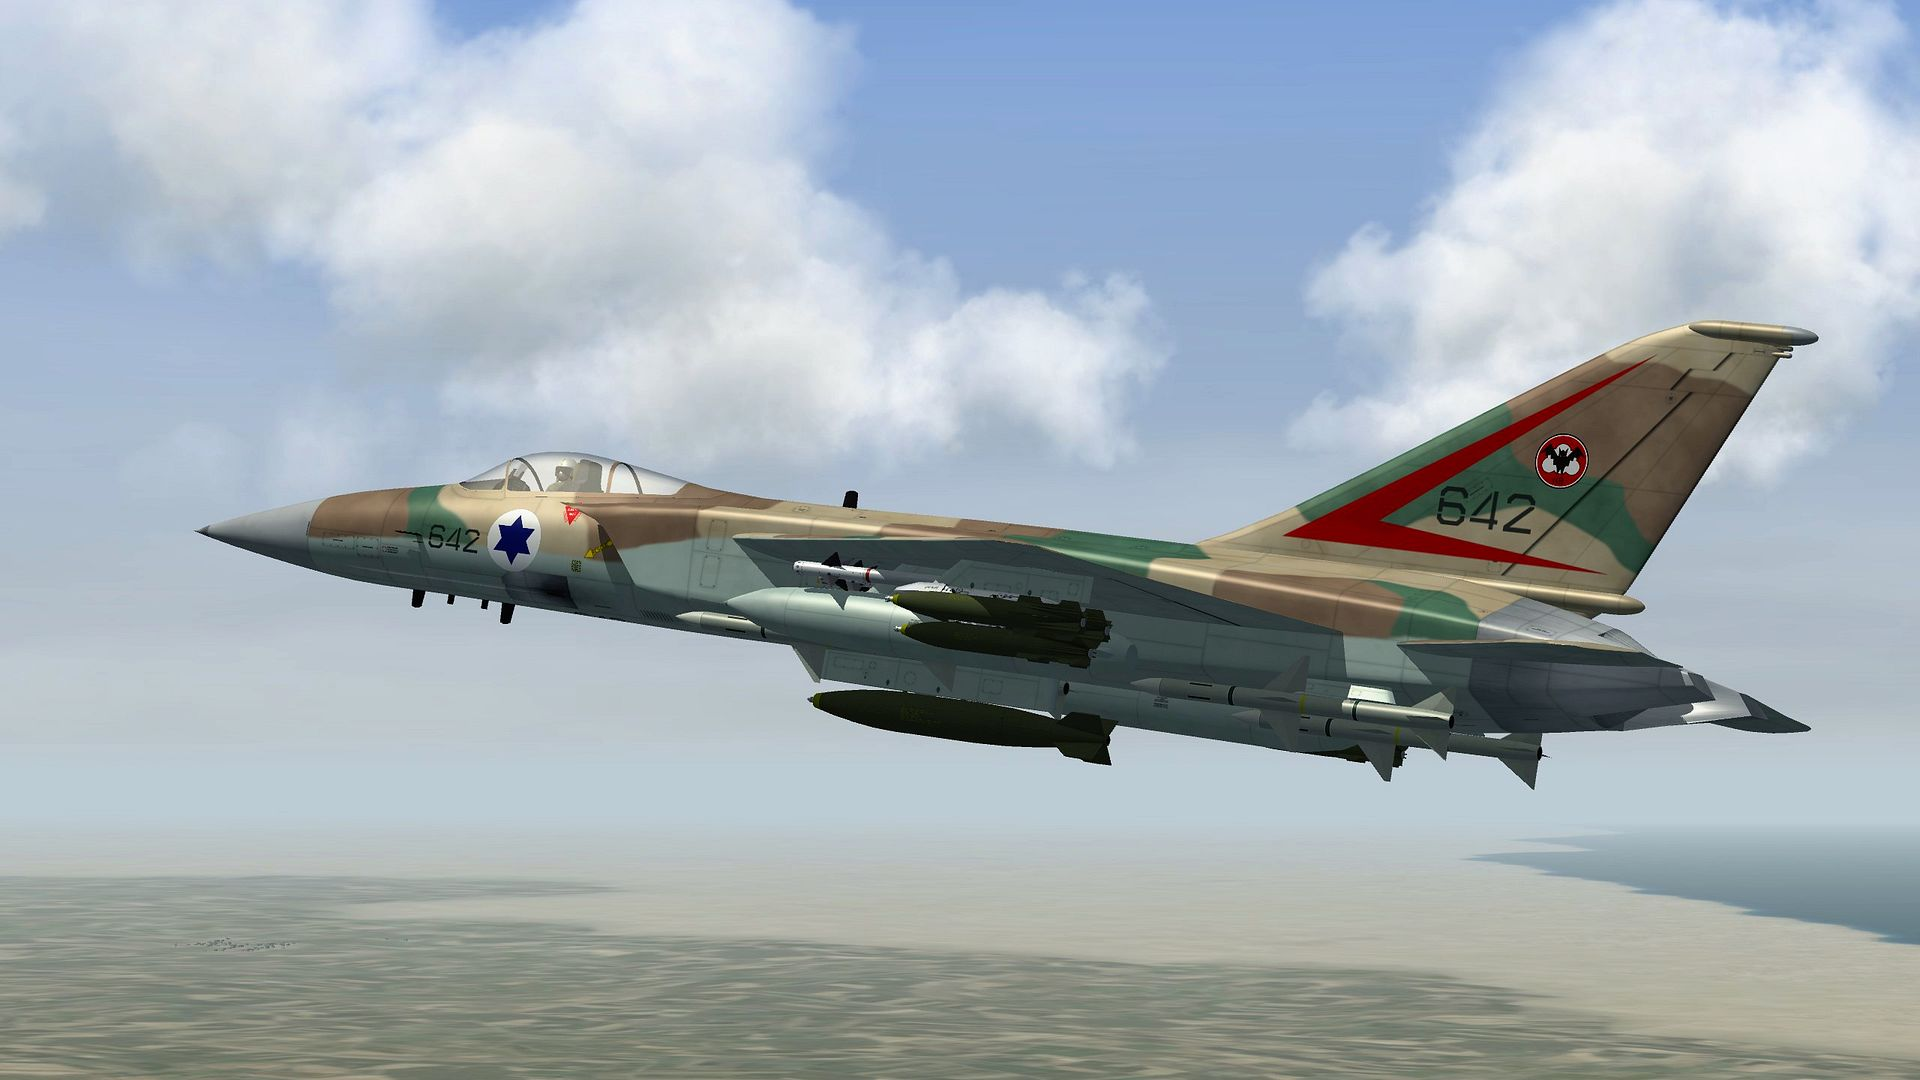 IDF%20CONDOR.06_zpstc13qaue.jpg